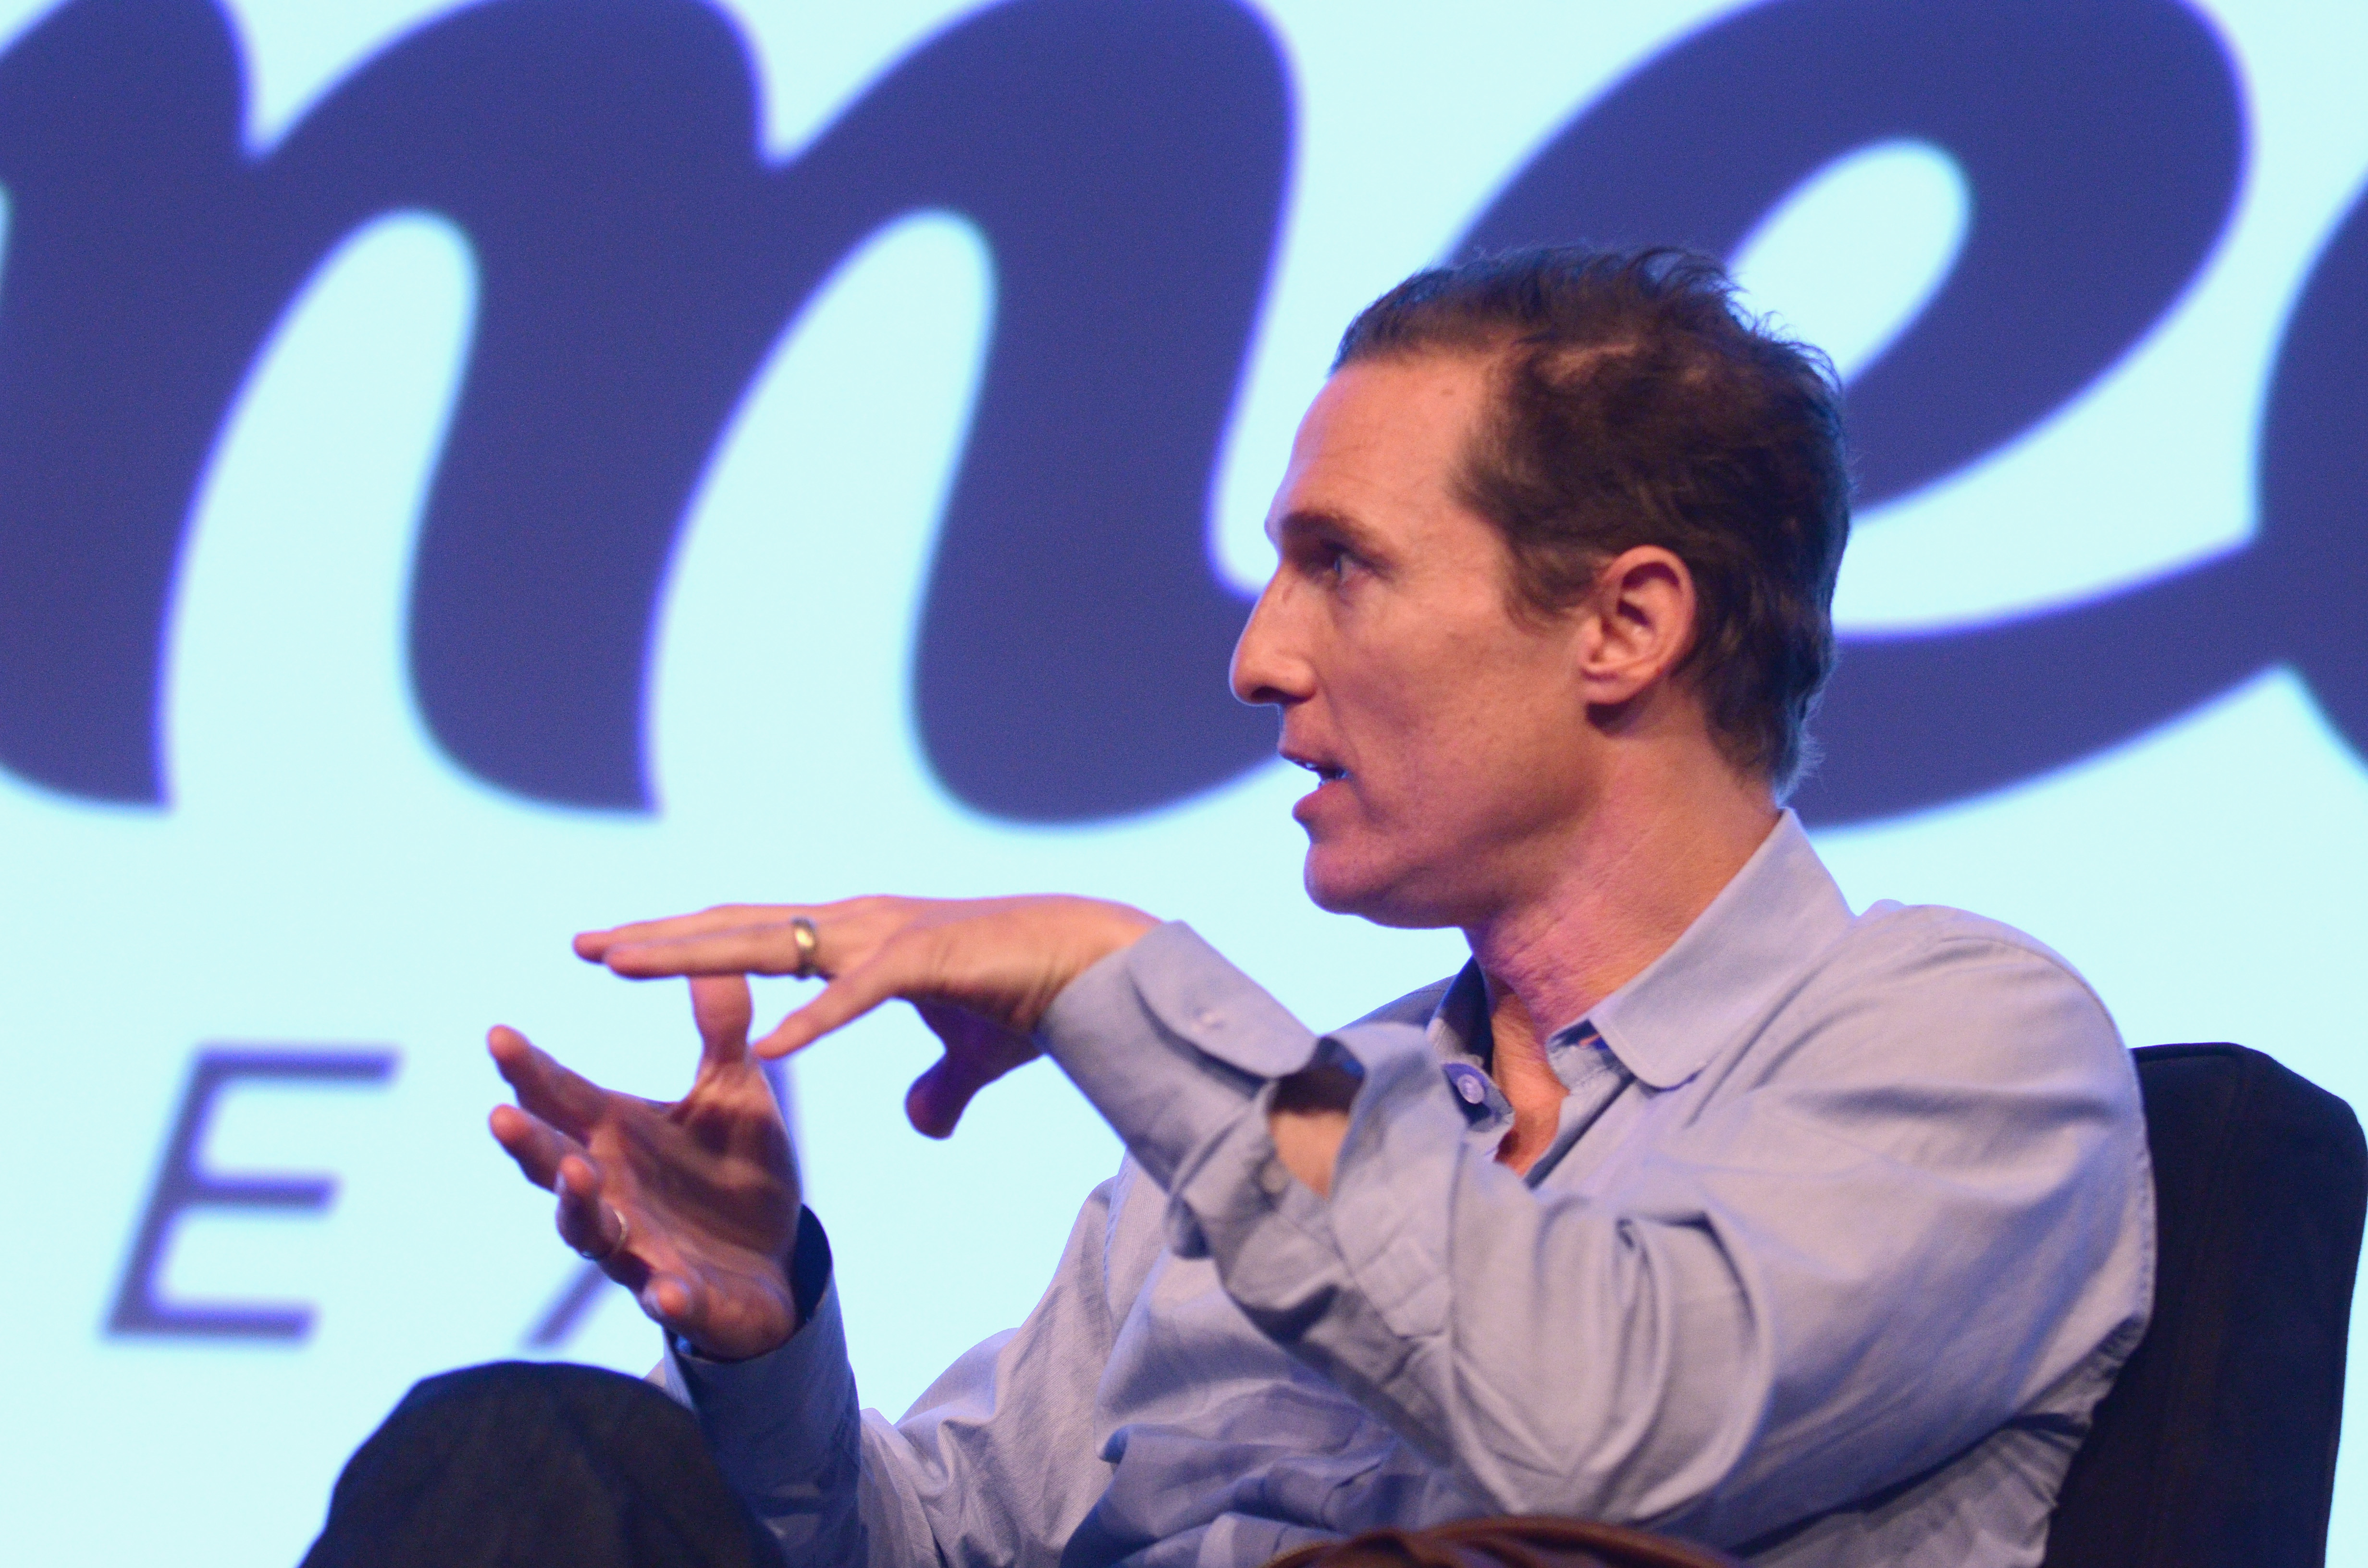 Matthew McConaughey took the stage at SXSW.